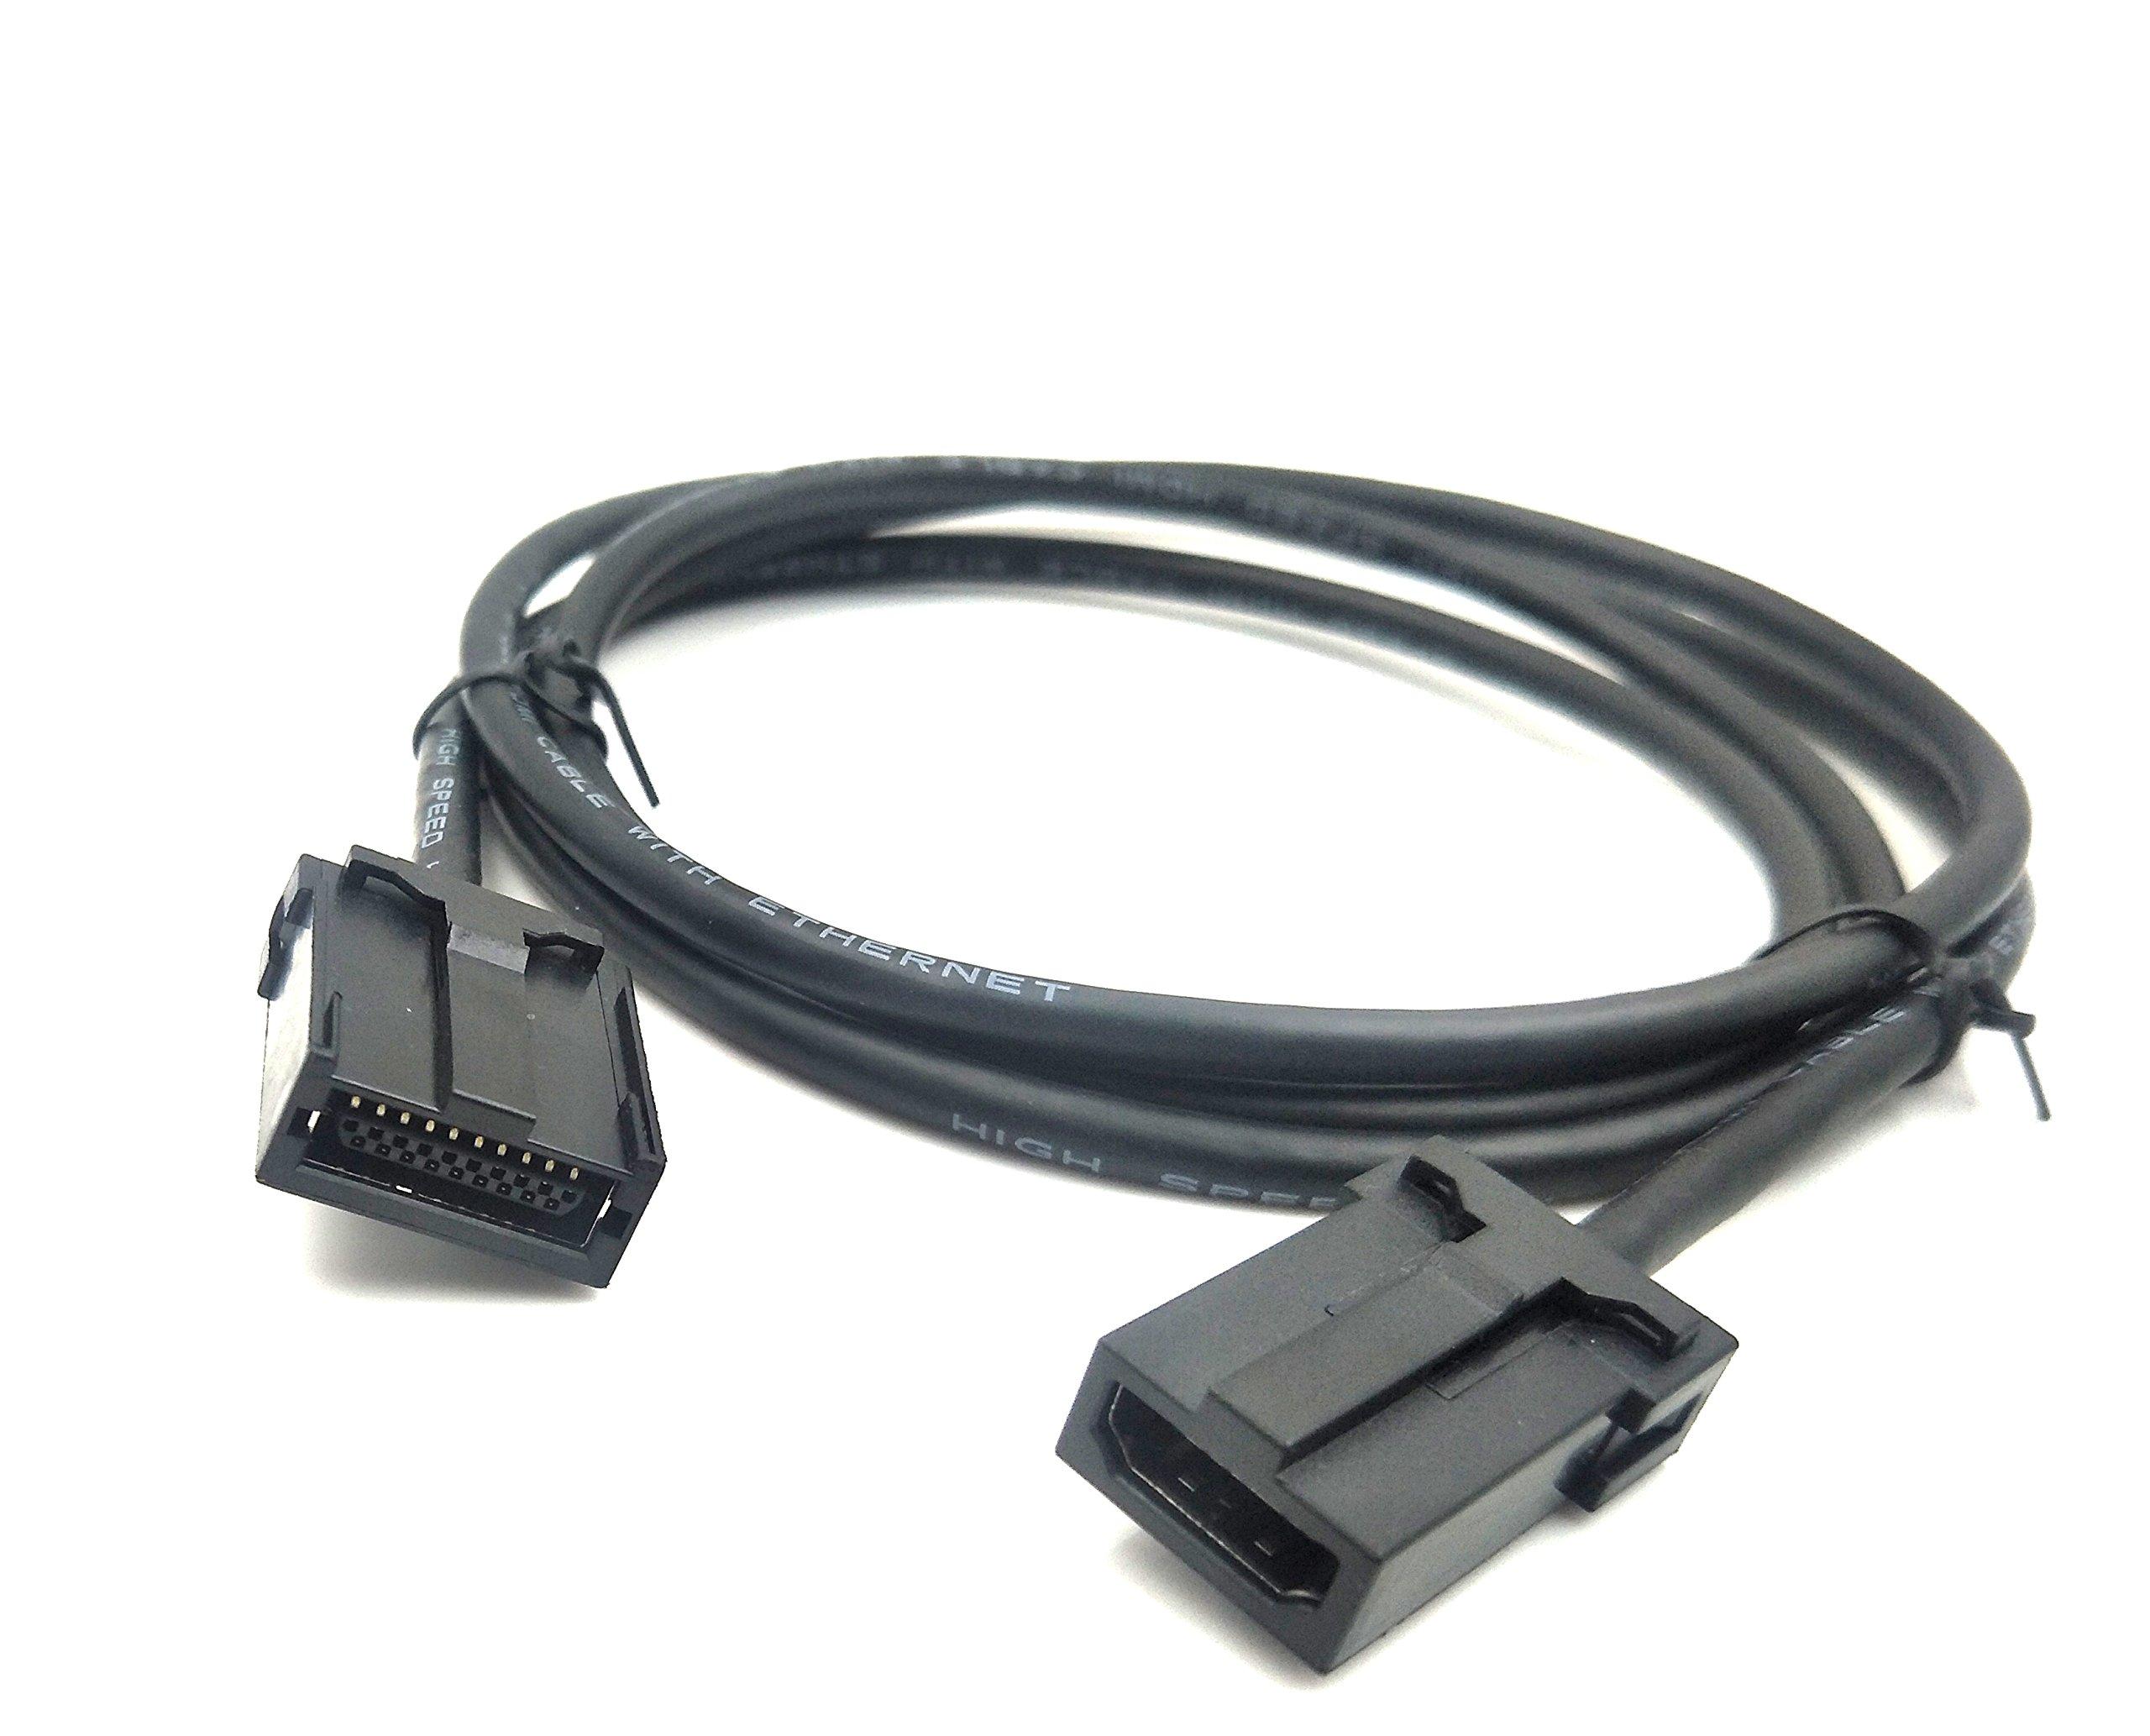 Exuun 1080P HDMI E Type to HDMI V1.4 A Cable, HDMI E Type to HDMI A Female Car HD AV Converter Extension Cable for Car Automotive Multimedia 5 feet/1.5m